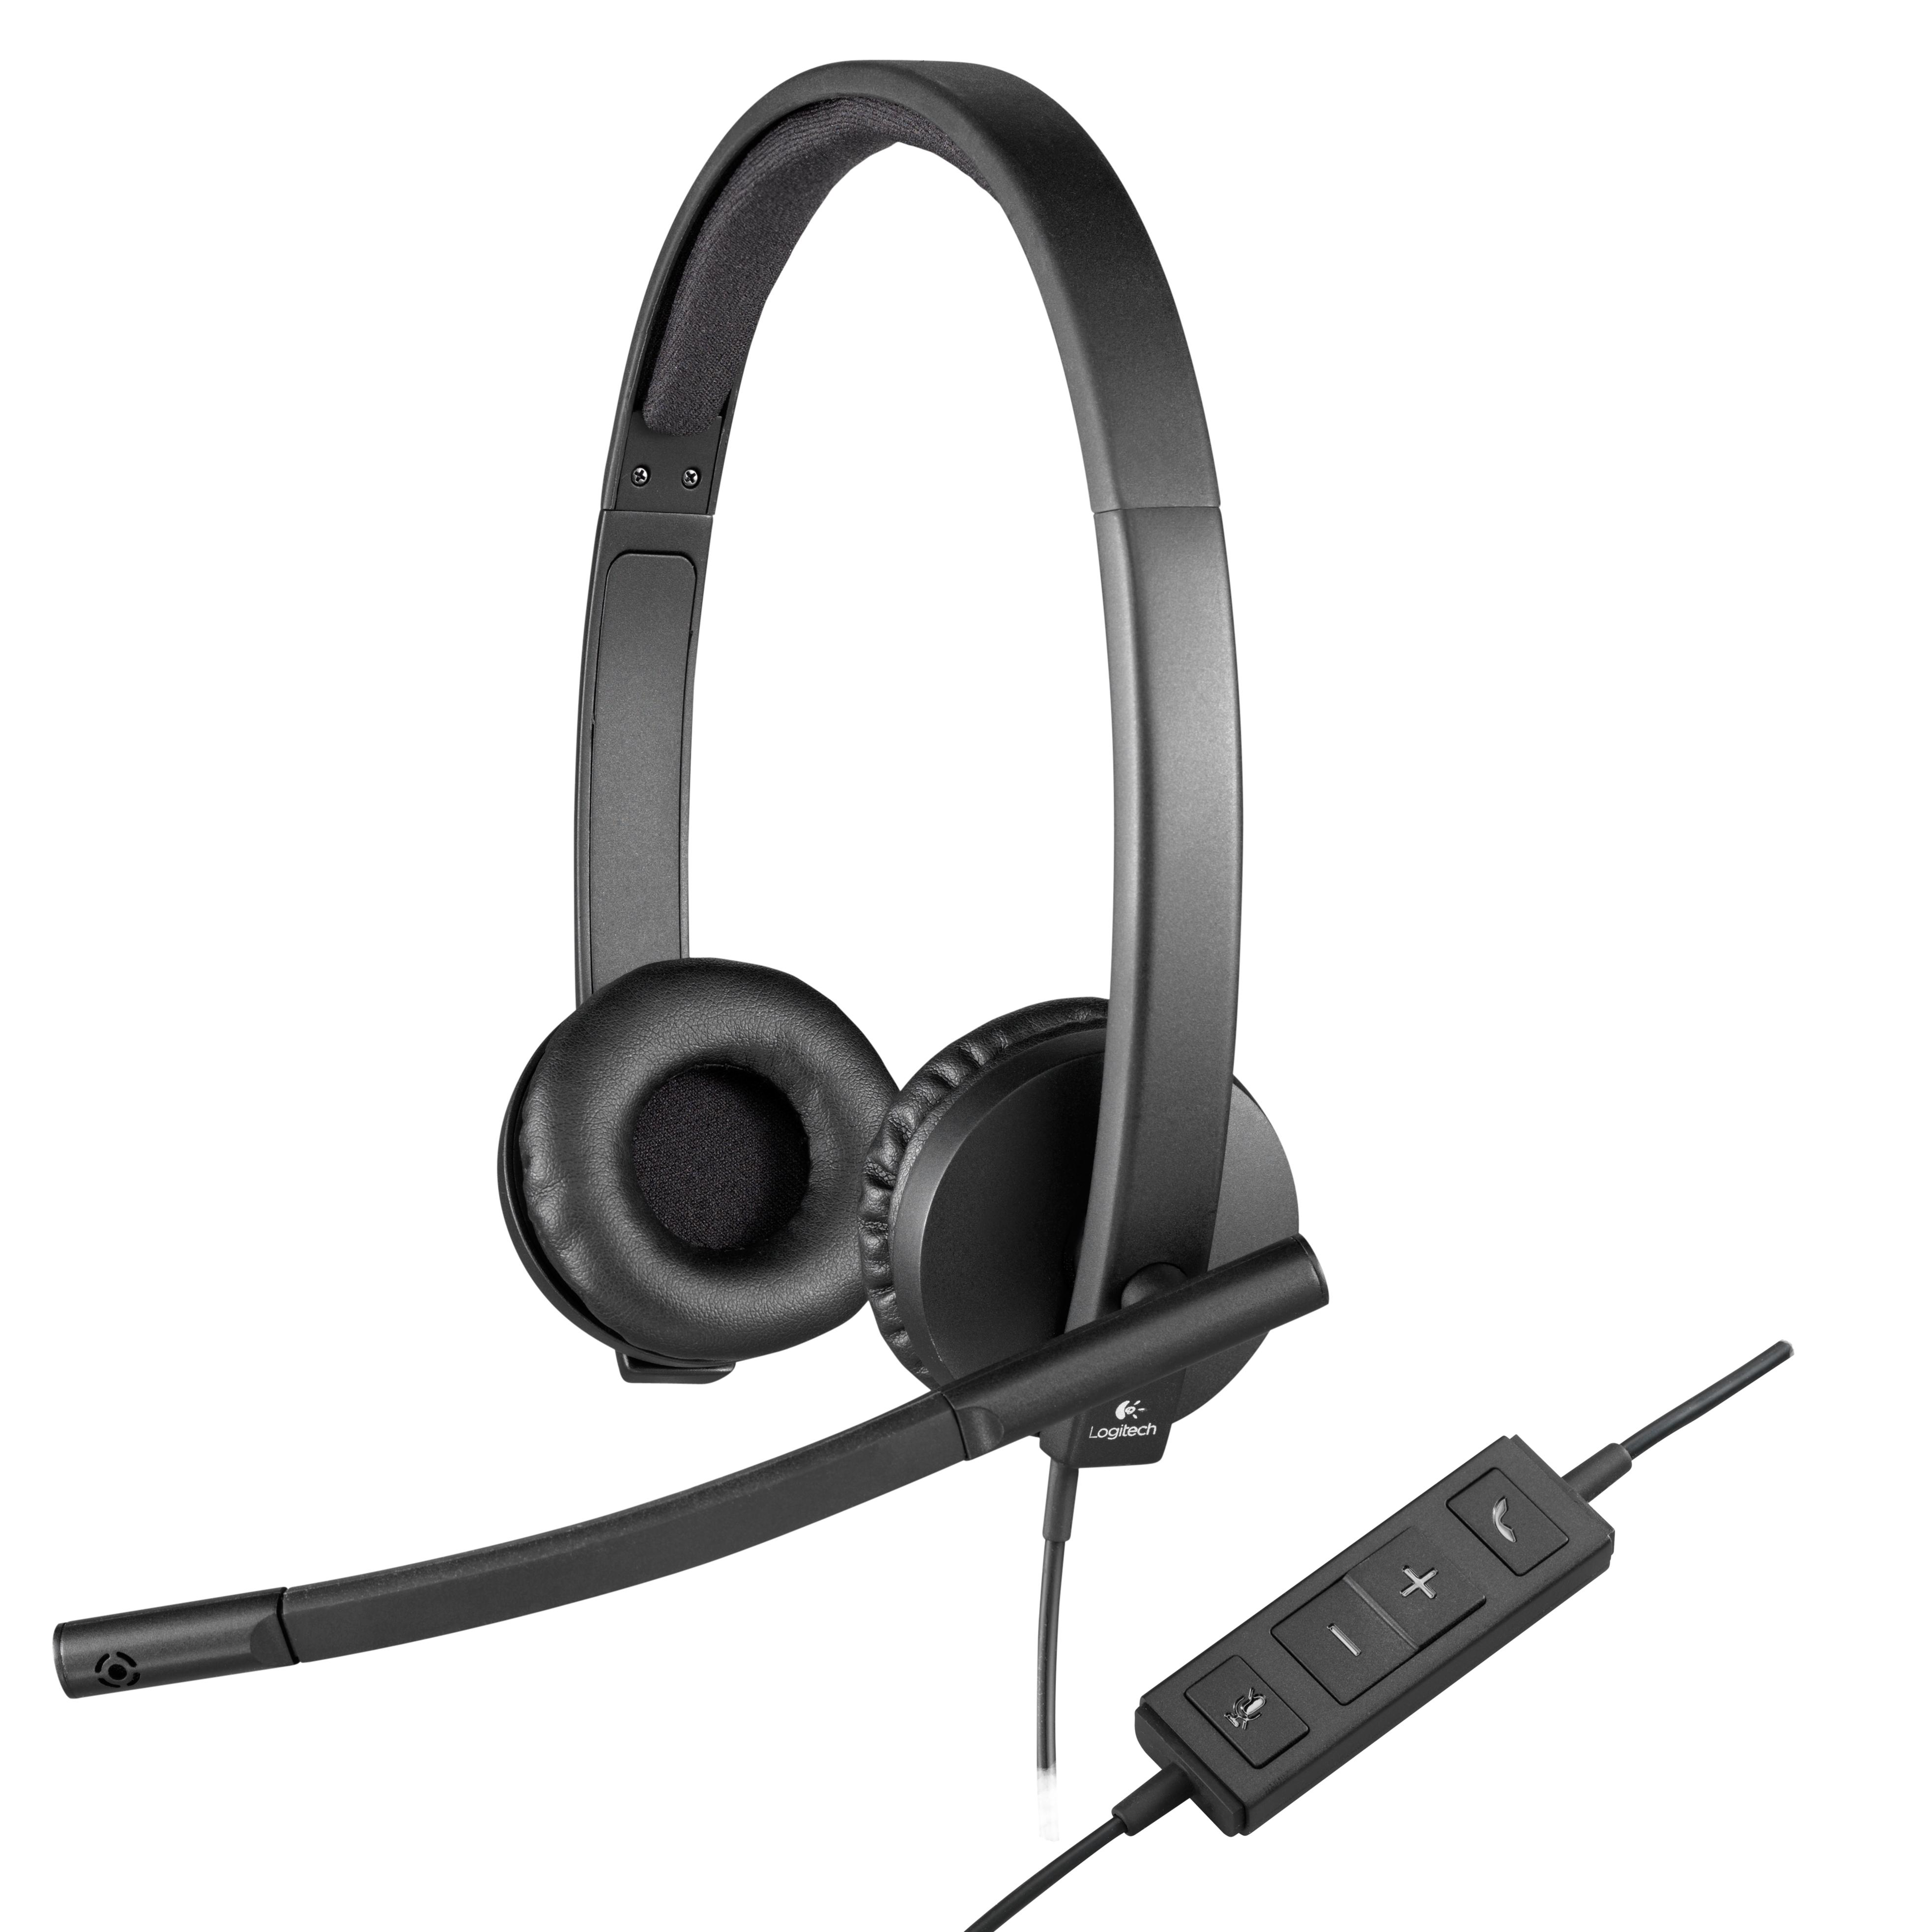 USB Diadema Logitech - Auricular - En Oreja - Cableado